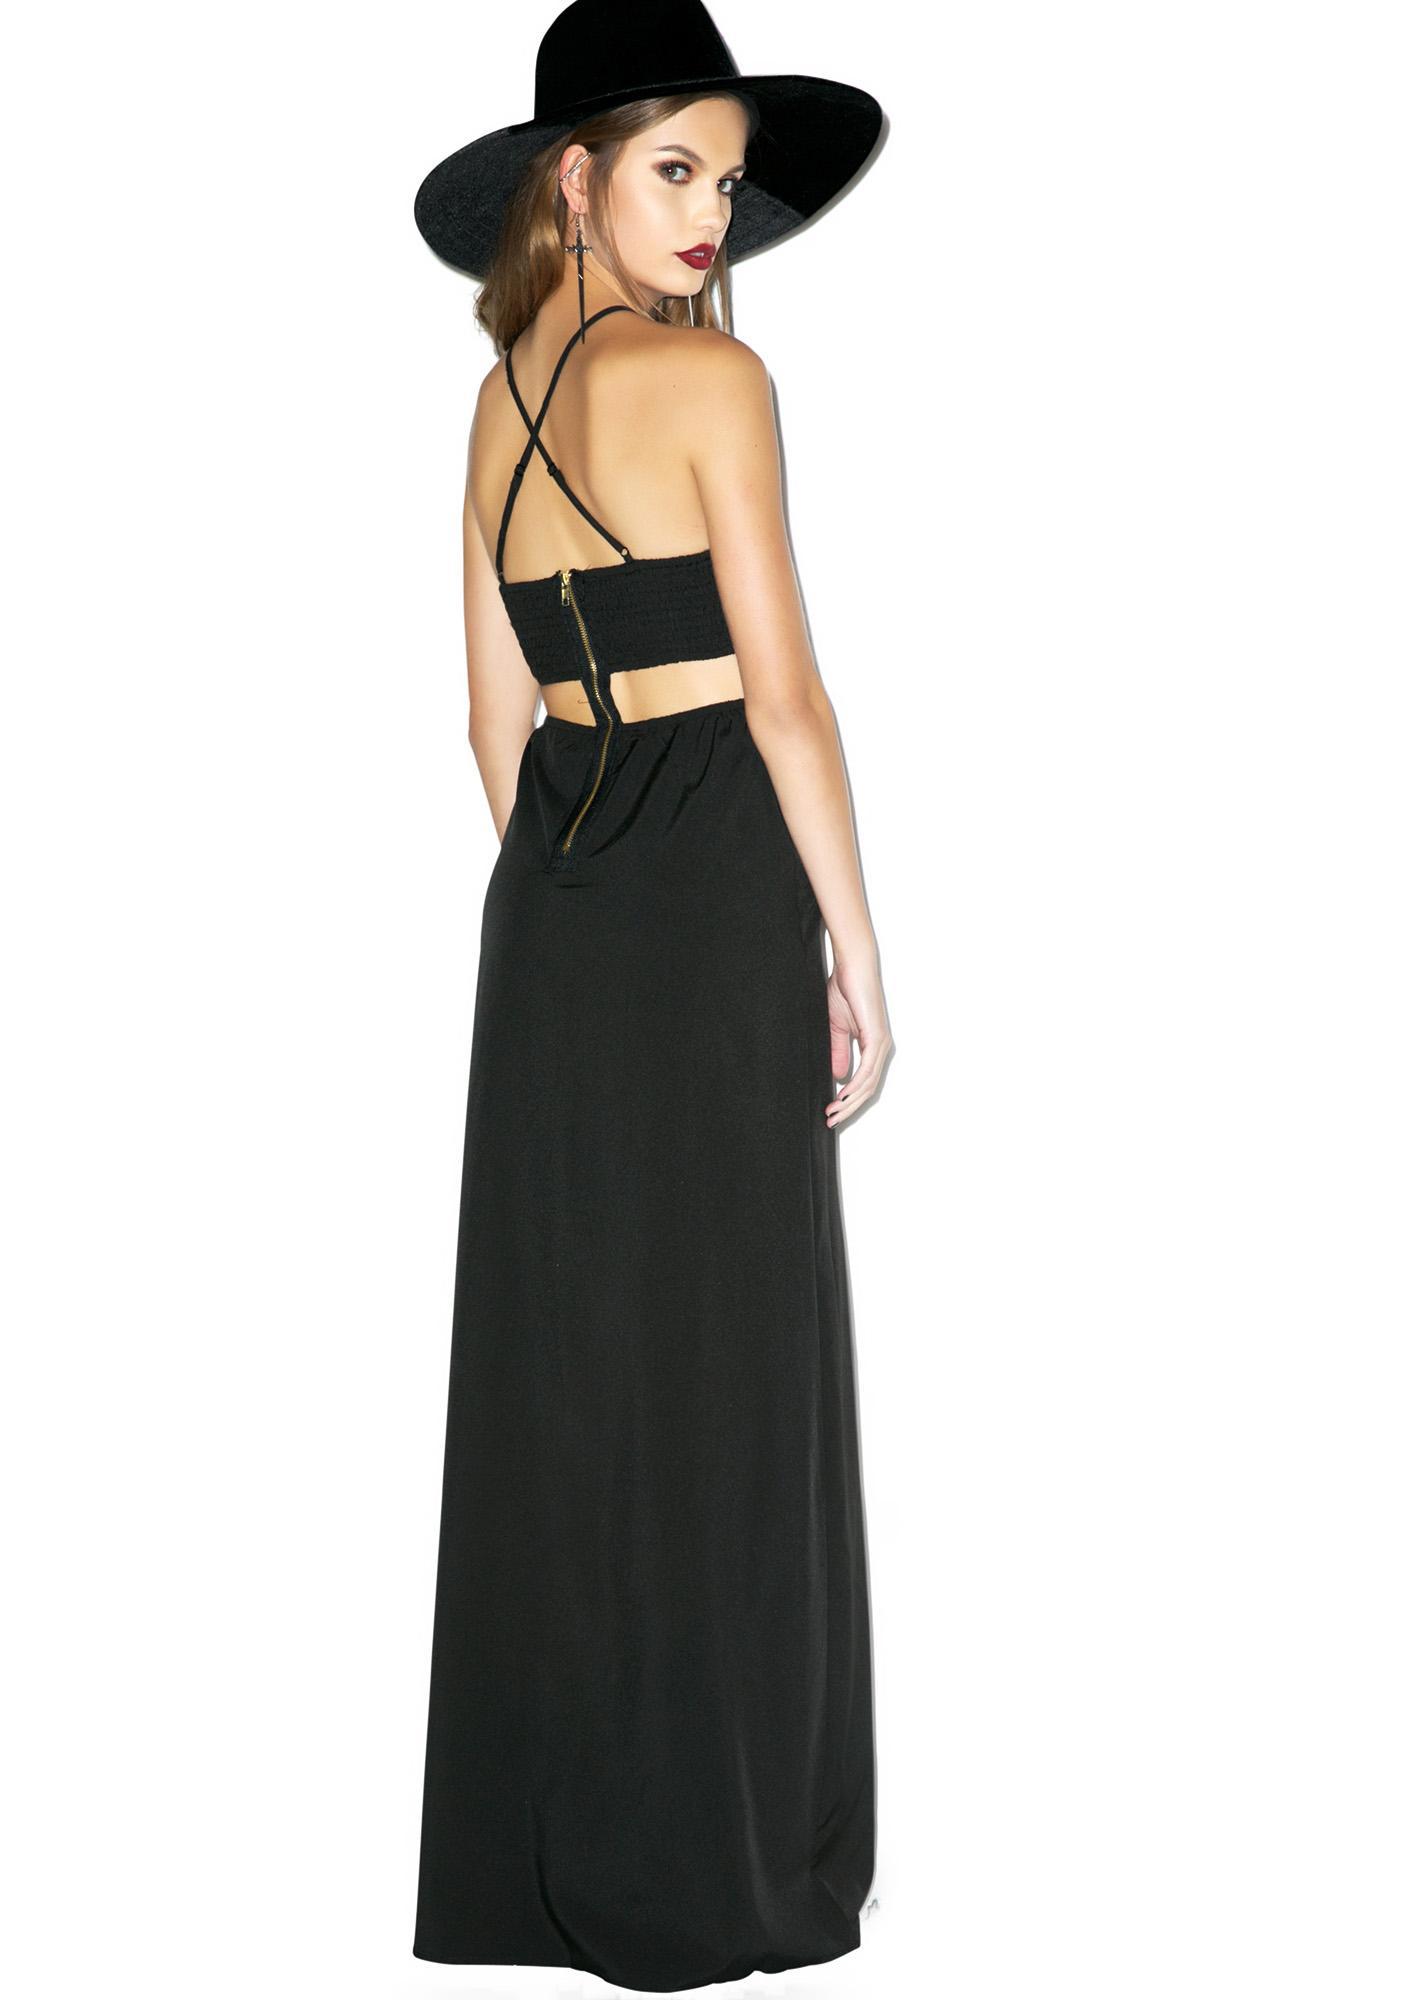 Glamazon Maxi Dress